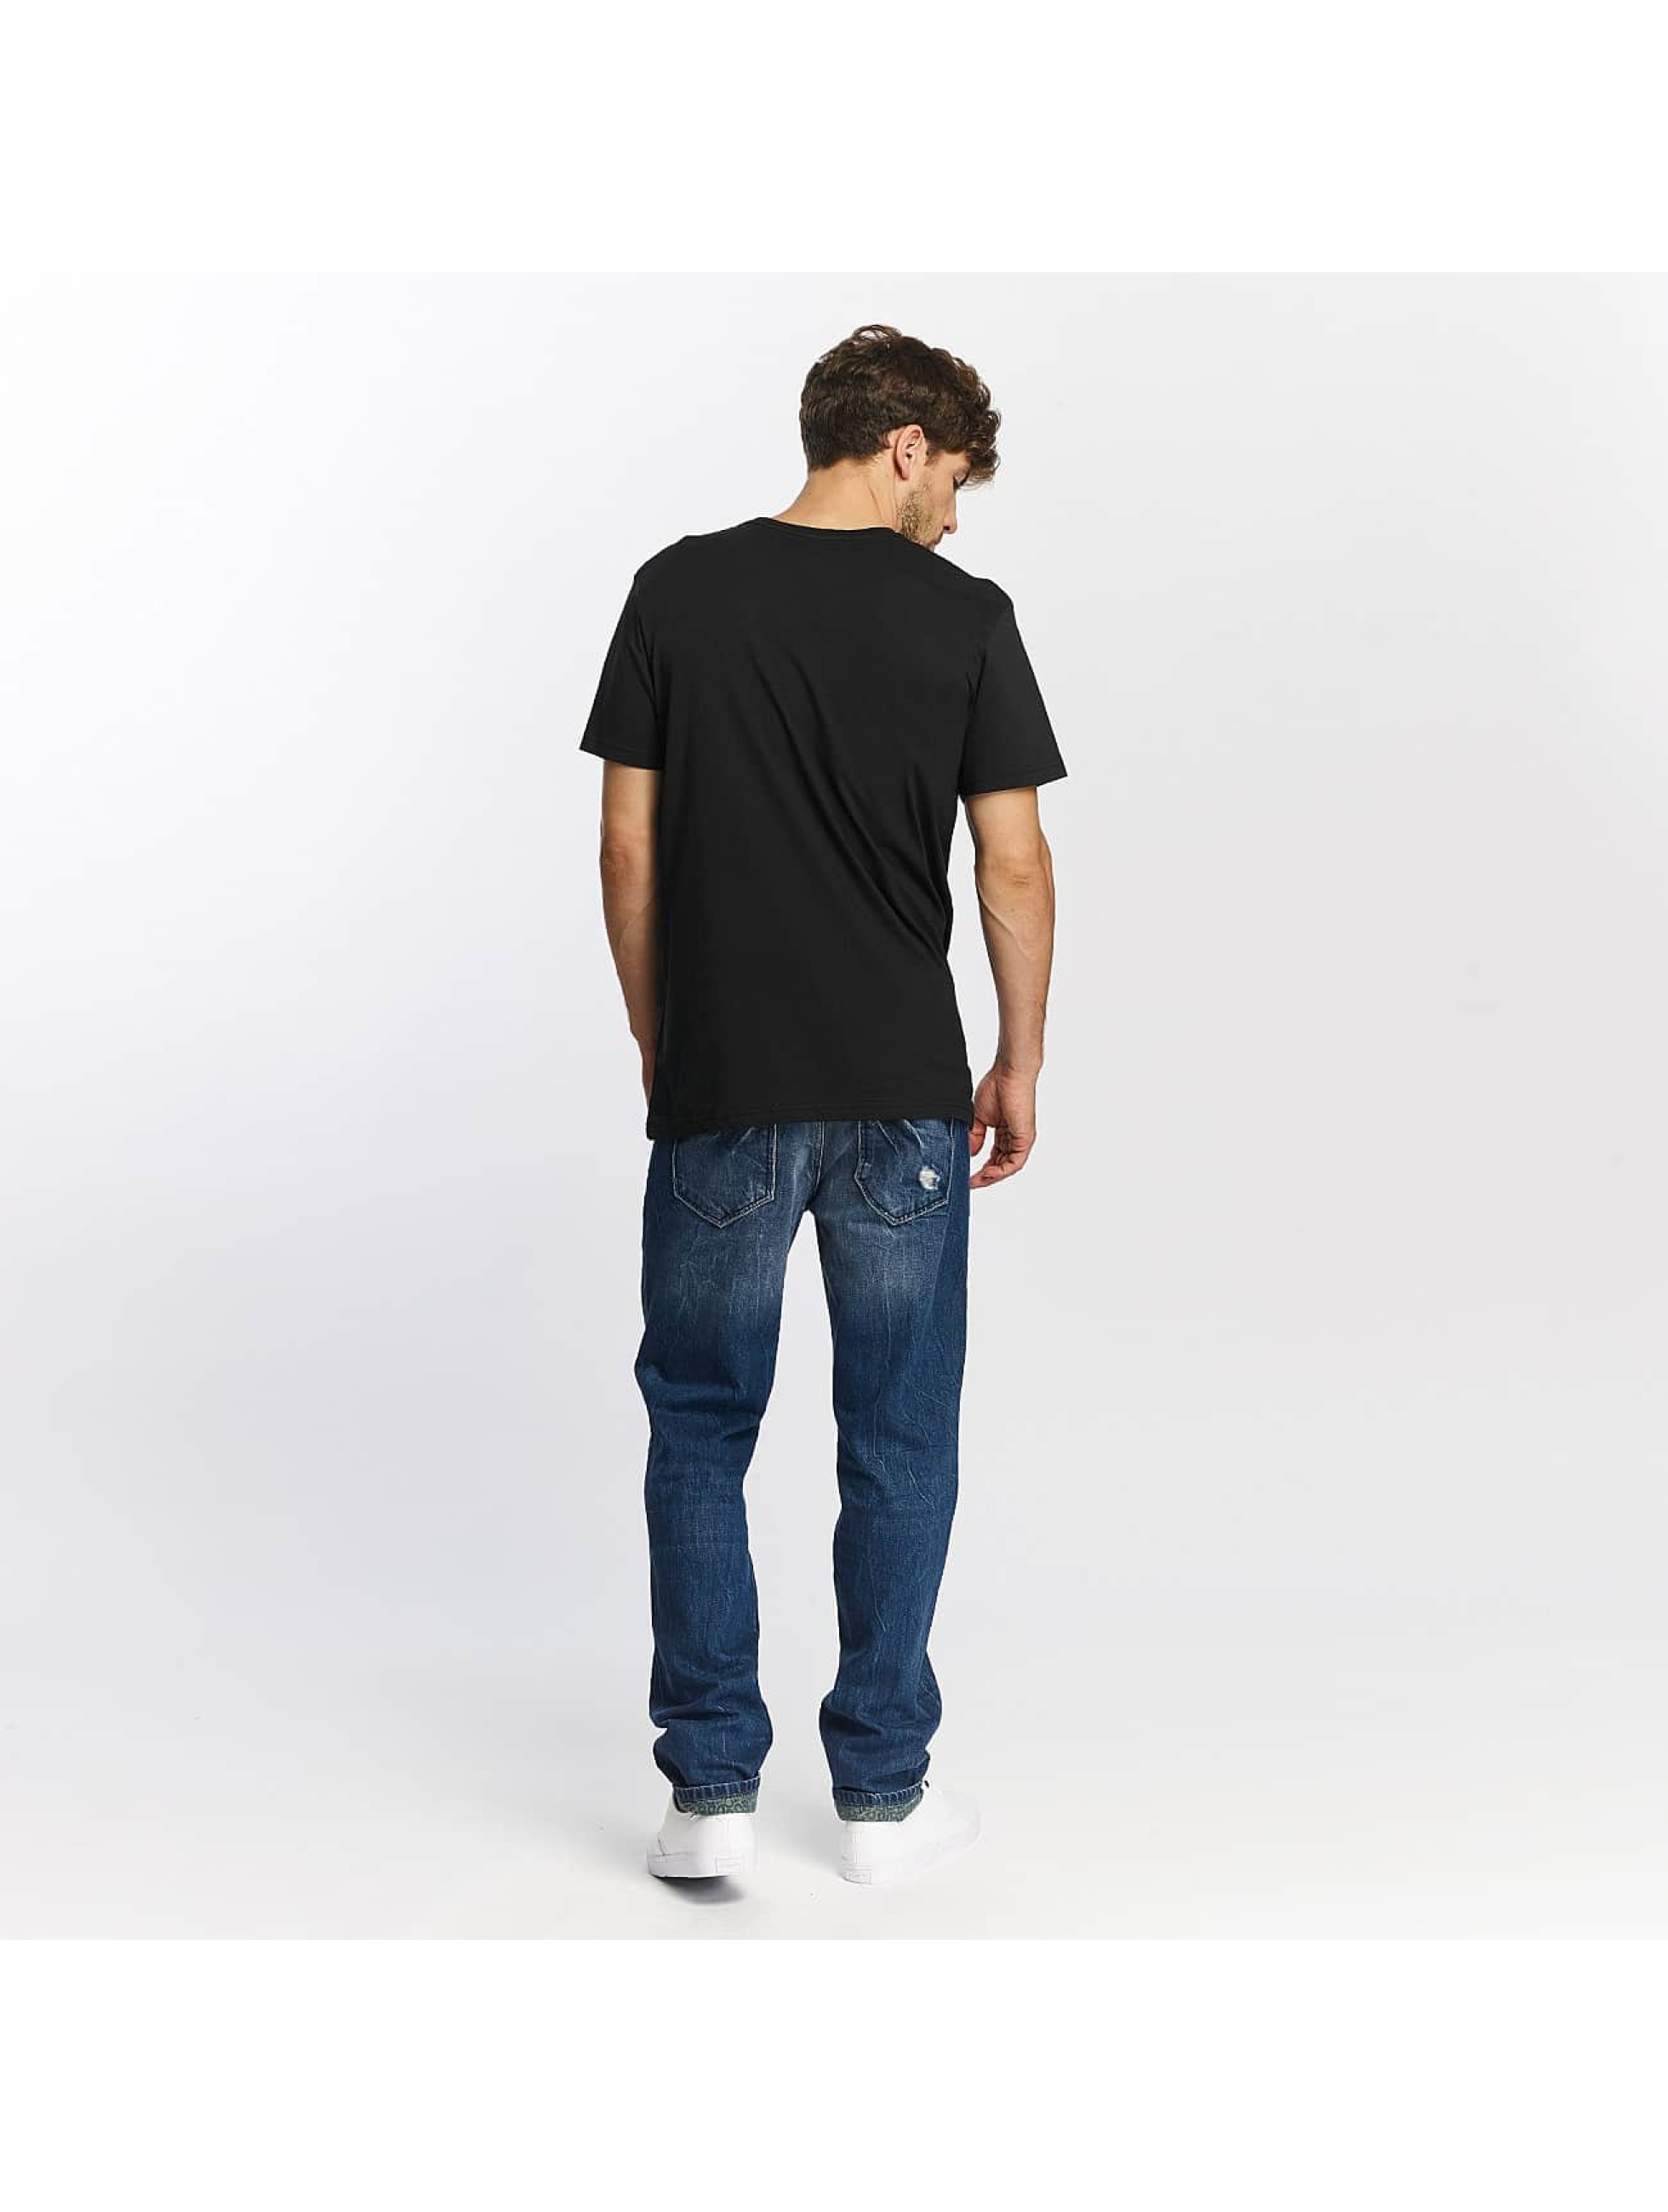 Quiksilver T-shirt Classic Comfort Place nero